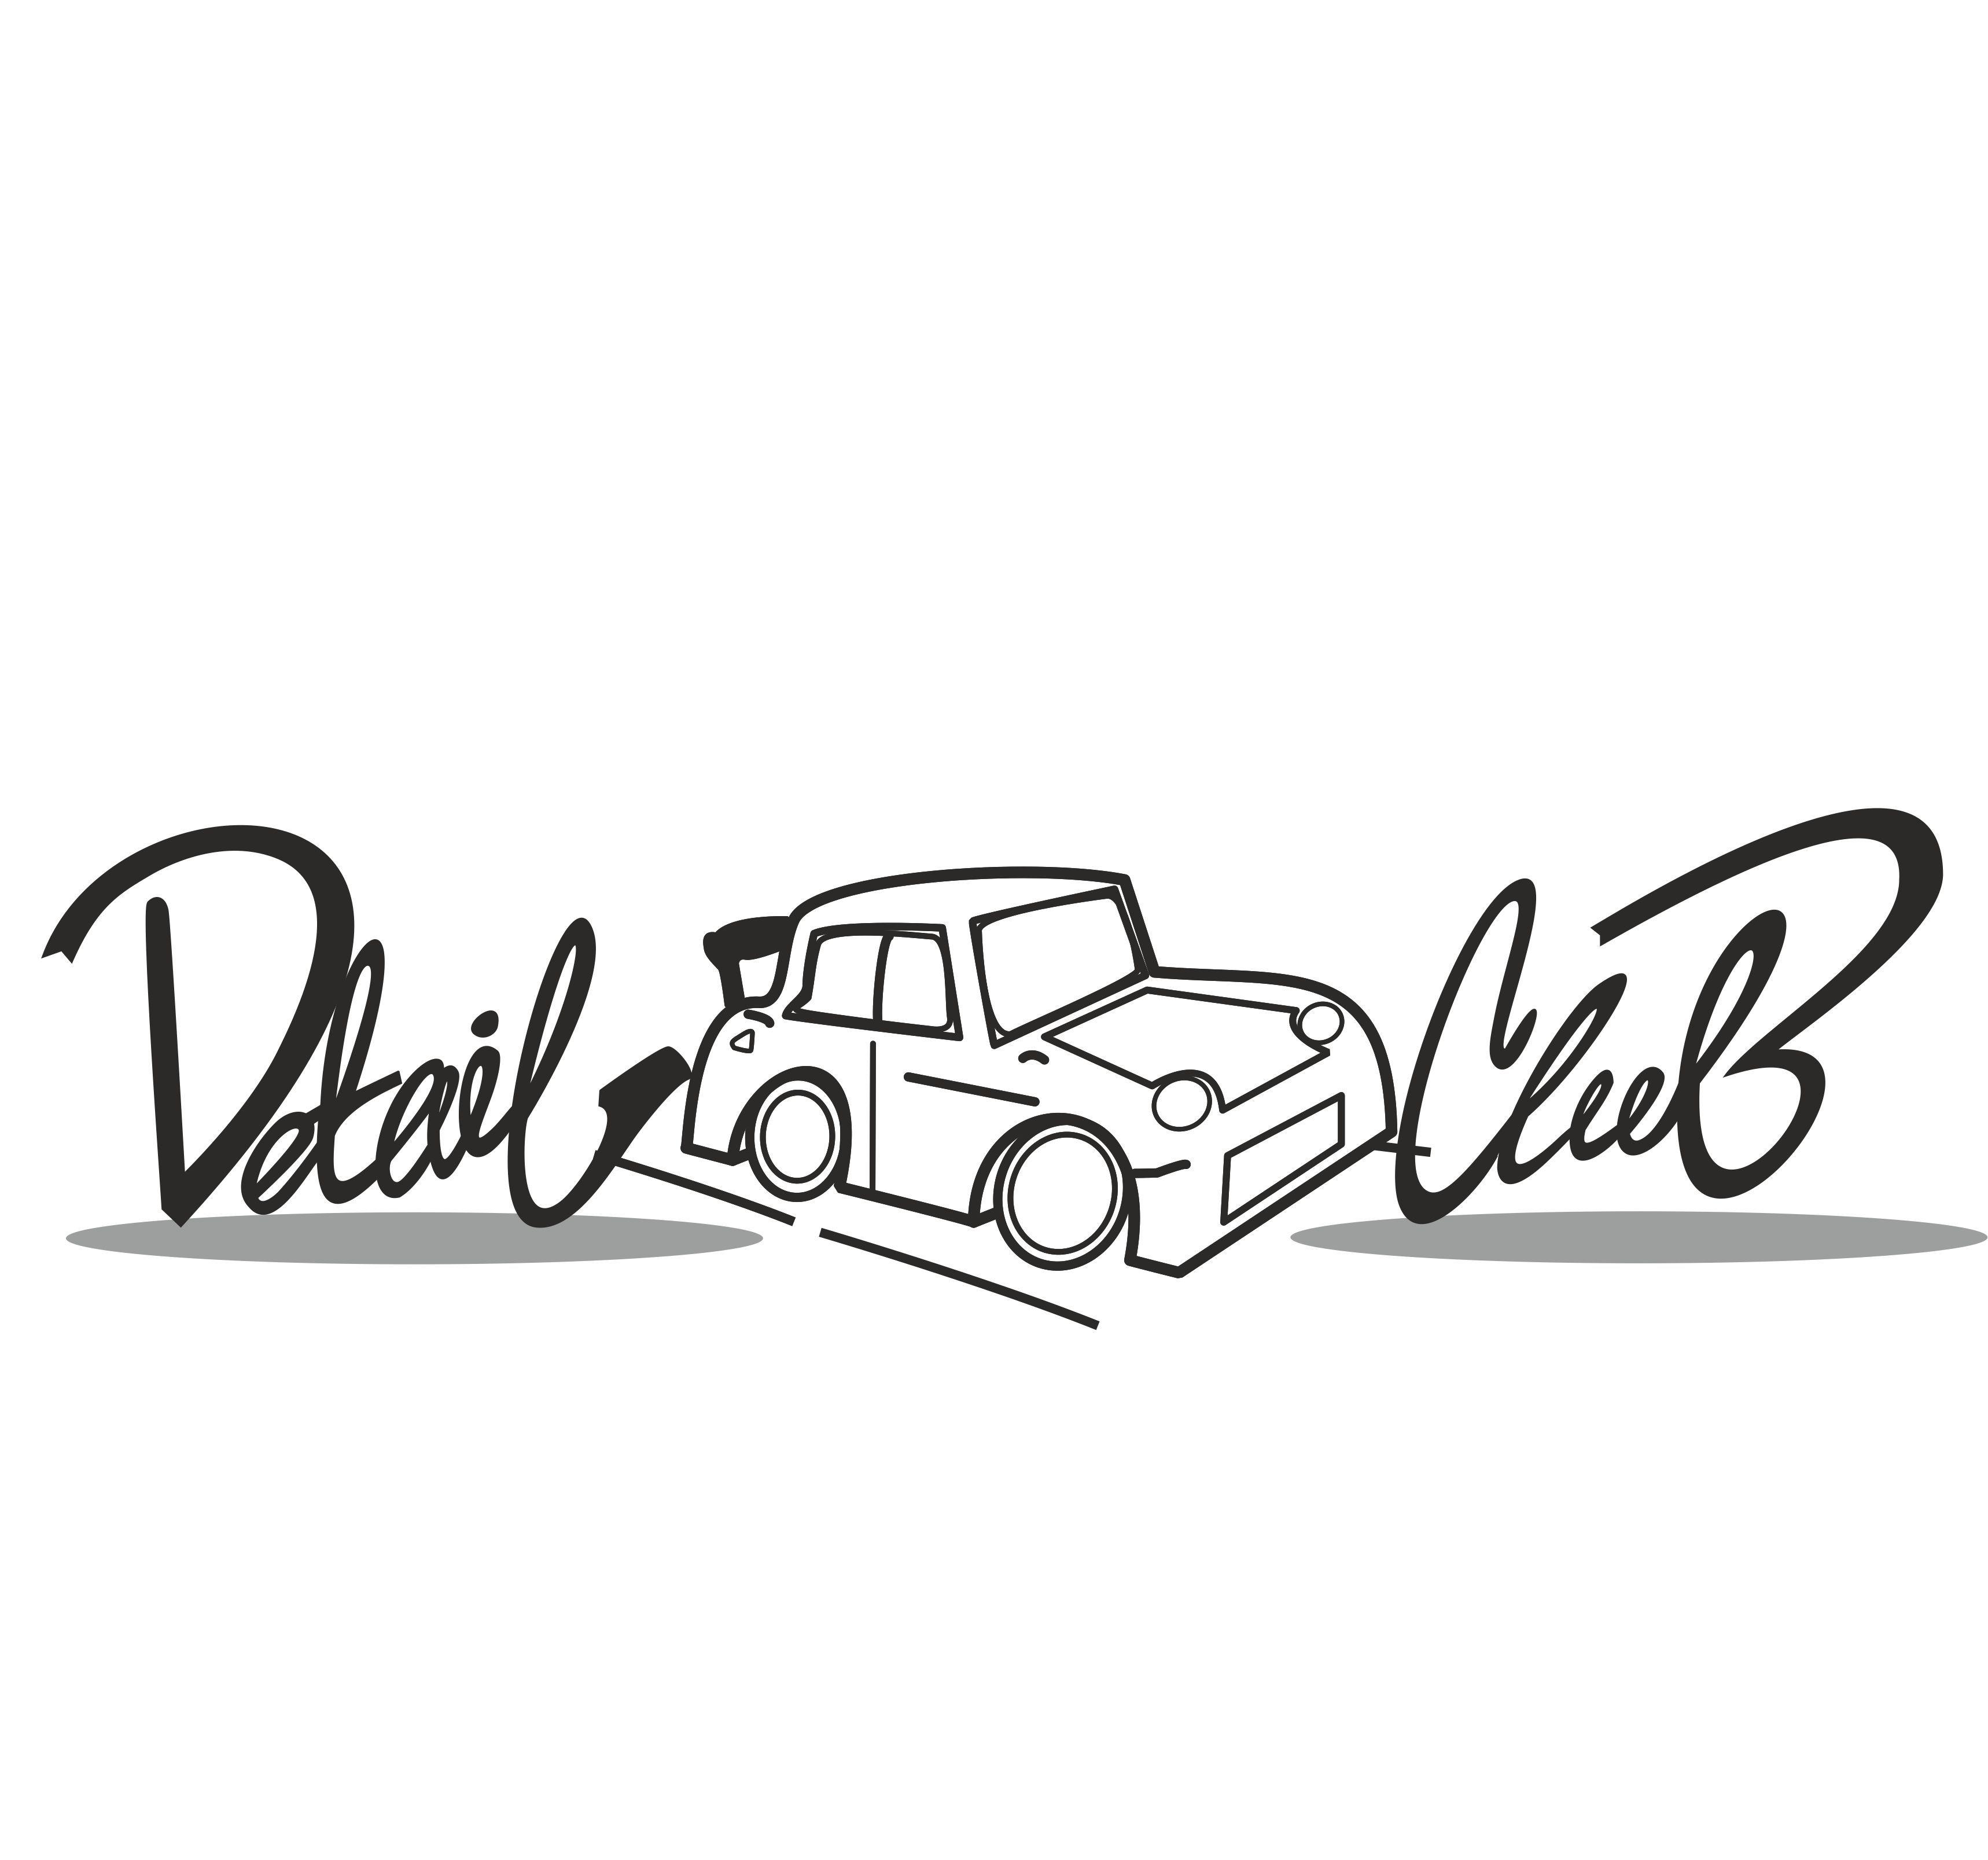 Логотип для компании (детейлинг студия) - дизайнер OlegHanpi